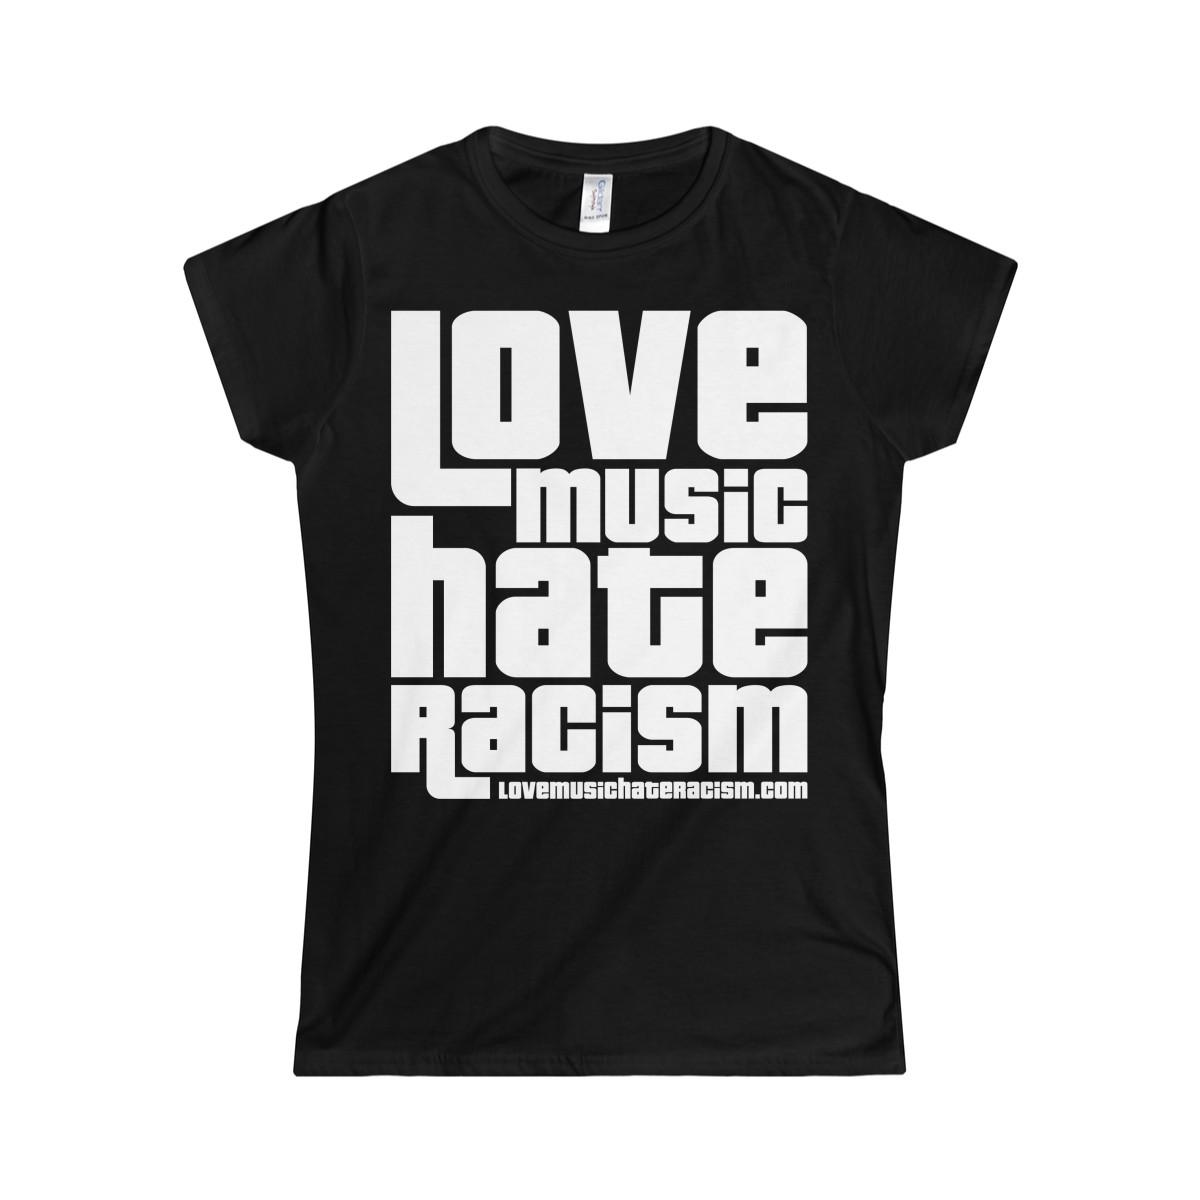 02cffa28 Description. Get the Original Love Music Hate Racism t-shirt.